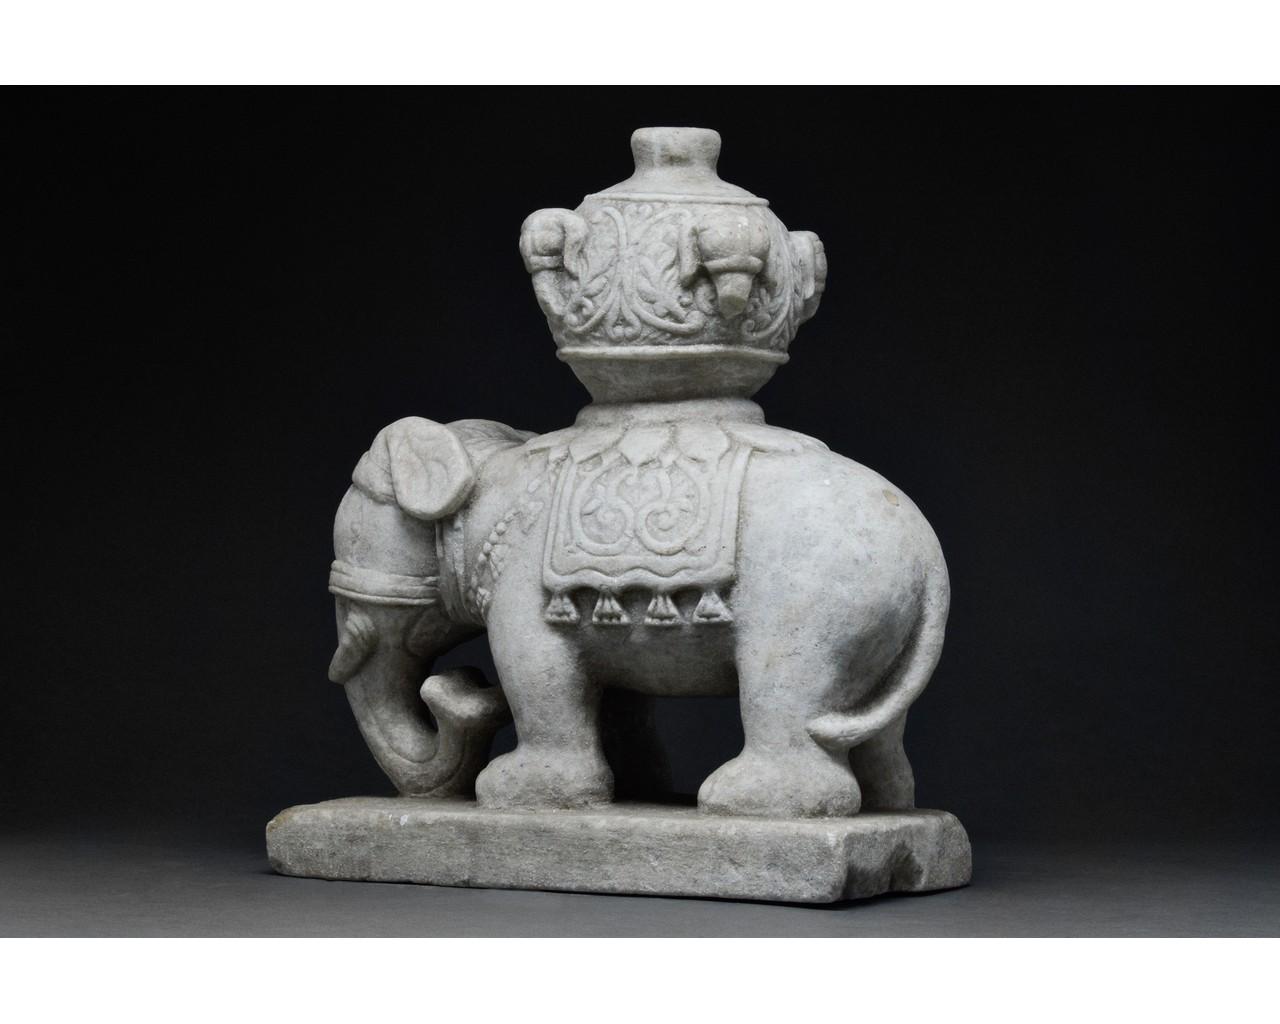 CHINESE MING DYNASTY MARBLE ELEPHANT - Image 3 of 6